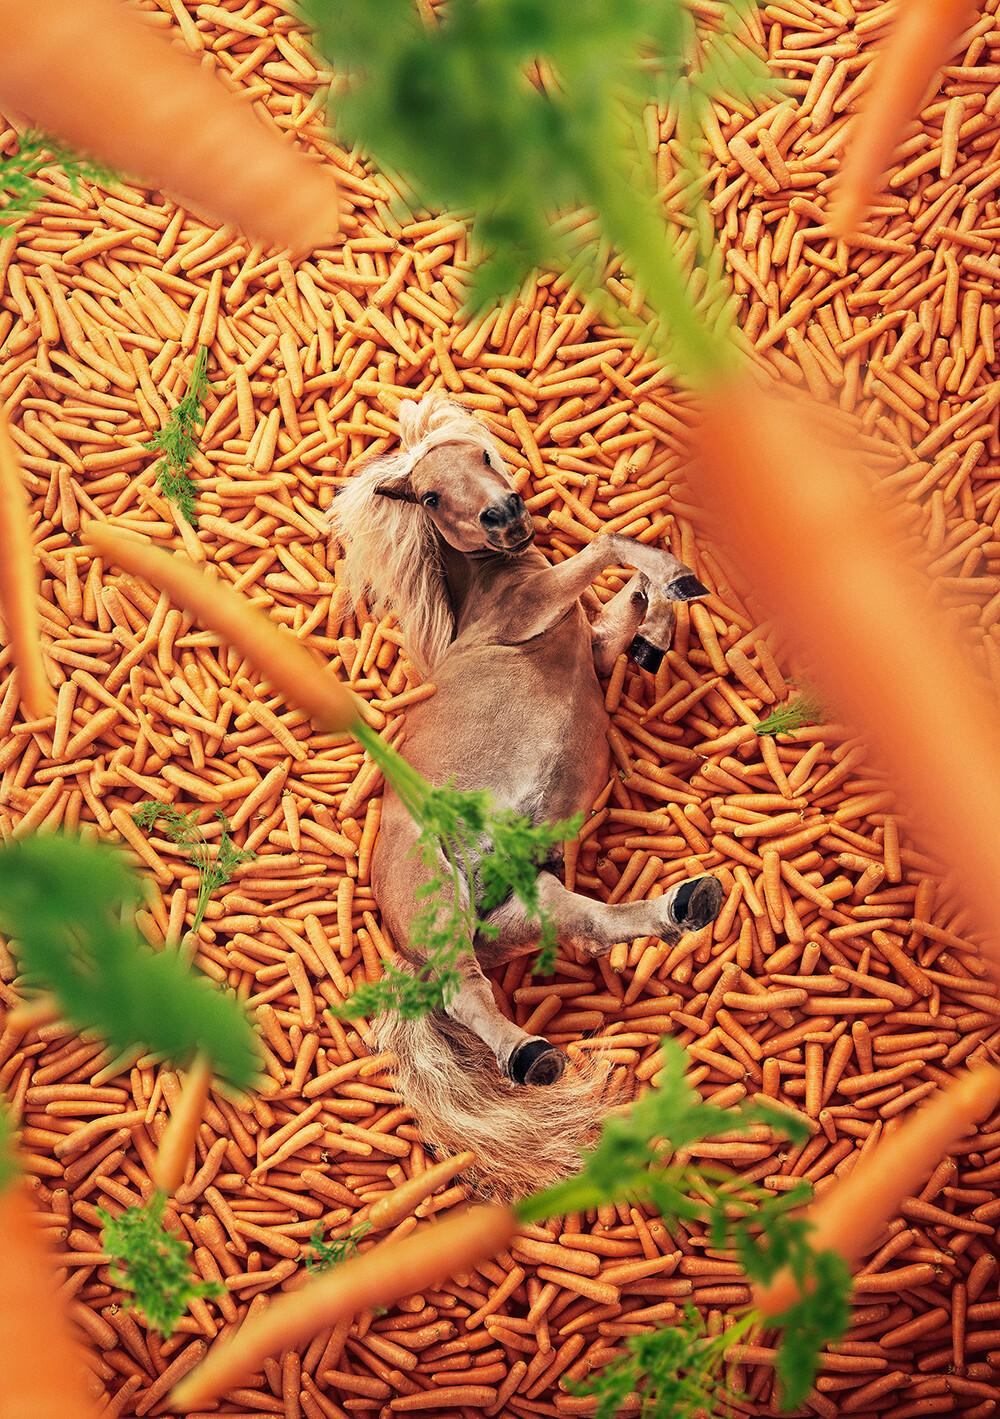 Alexander crispin atg vinnie carrots americanbeaty